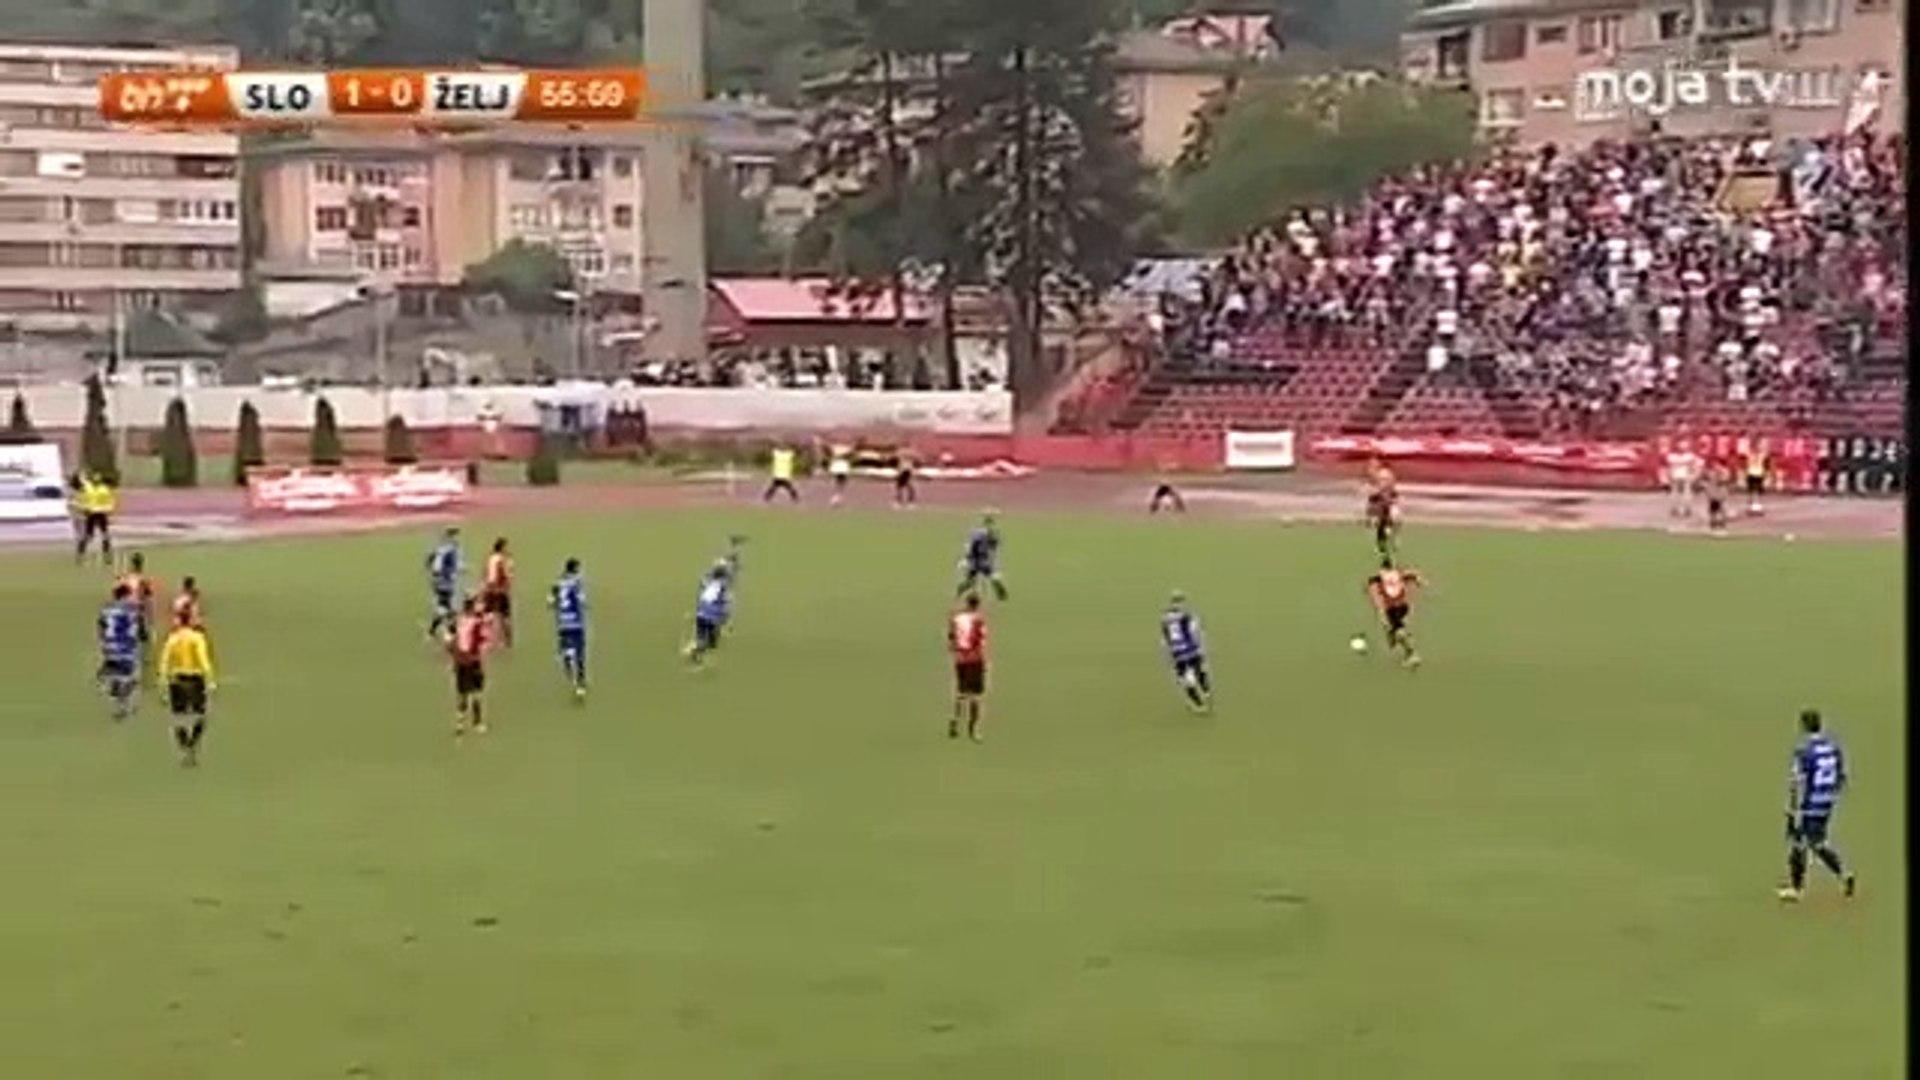 FK Sloboda - FK Željezničar - 2-0 Stjepanović 56' min.